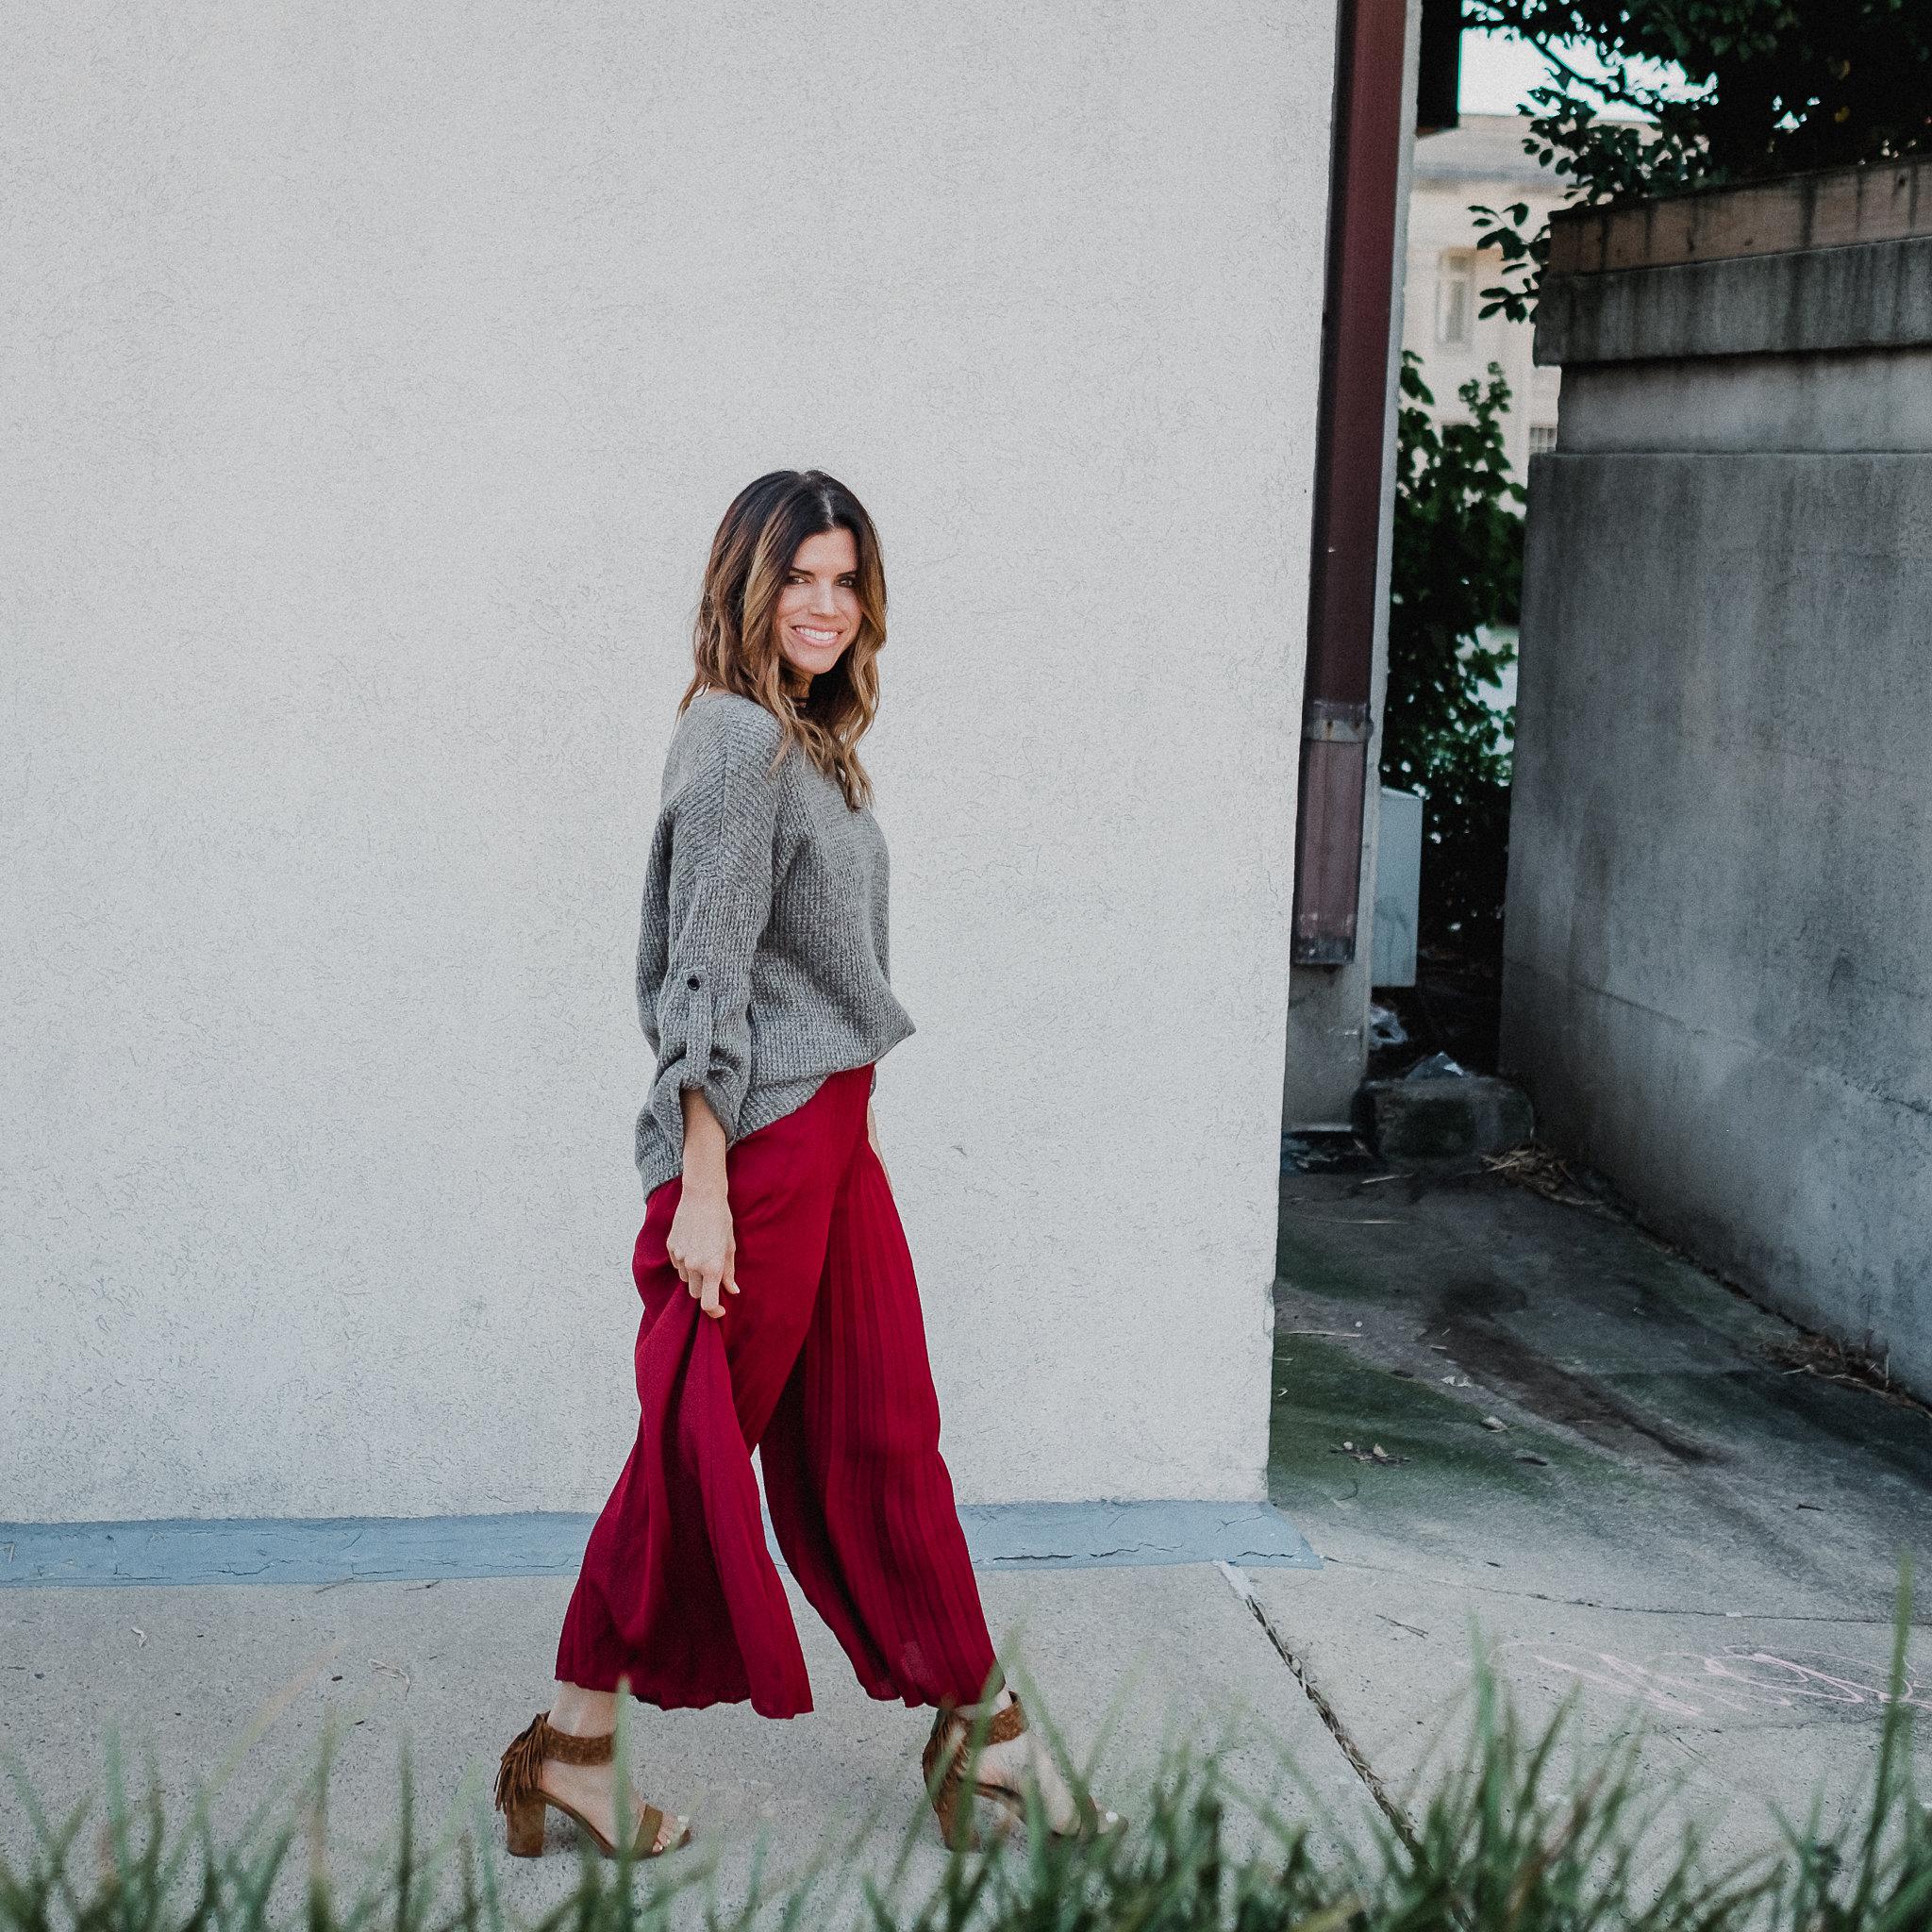 fashion-blogger-great-fall-looks.jpg